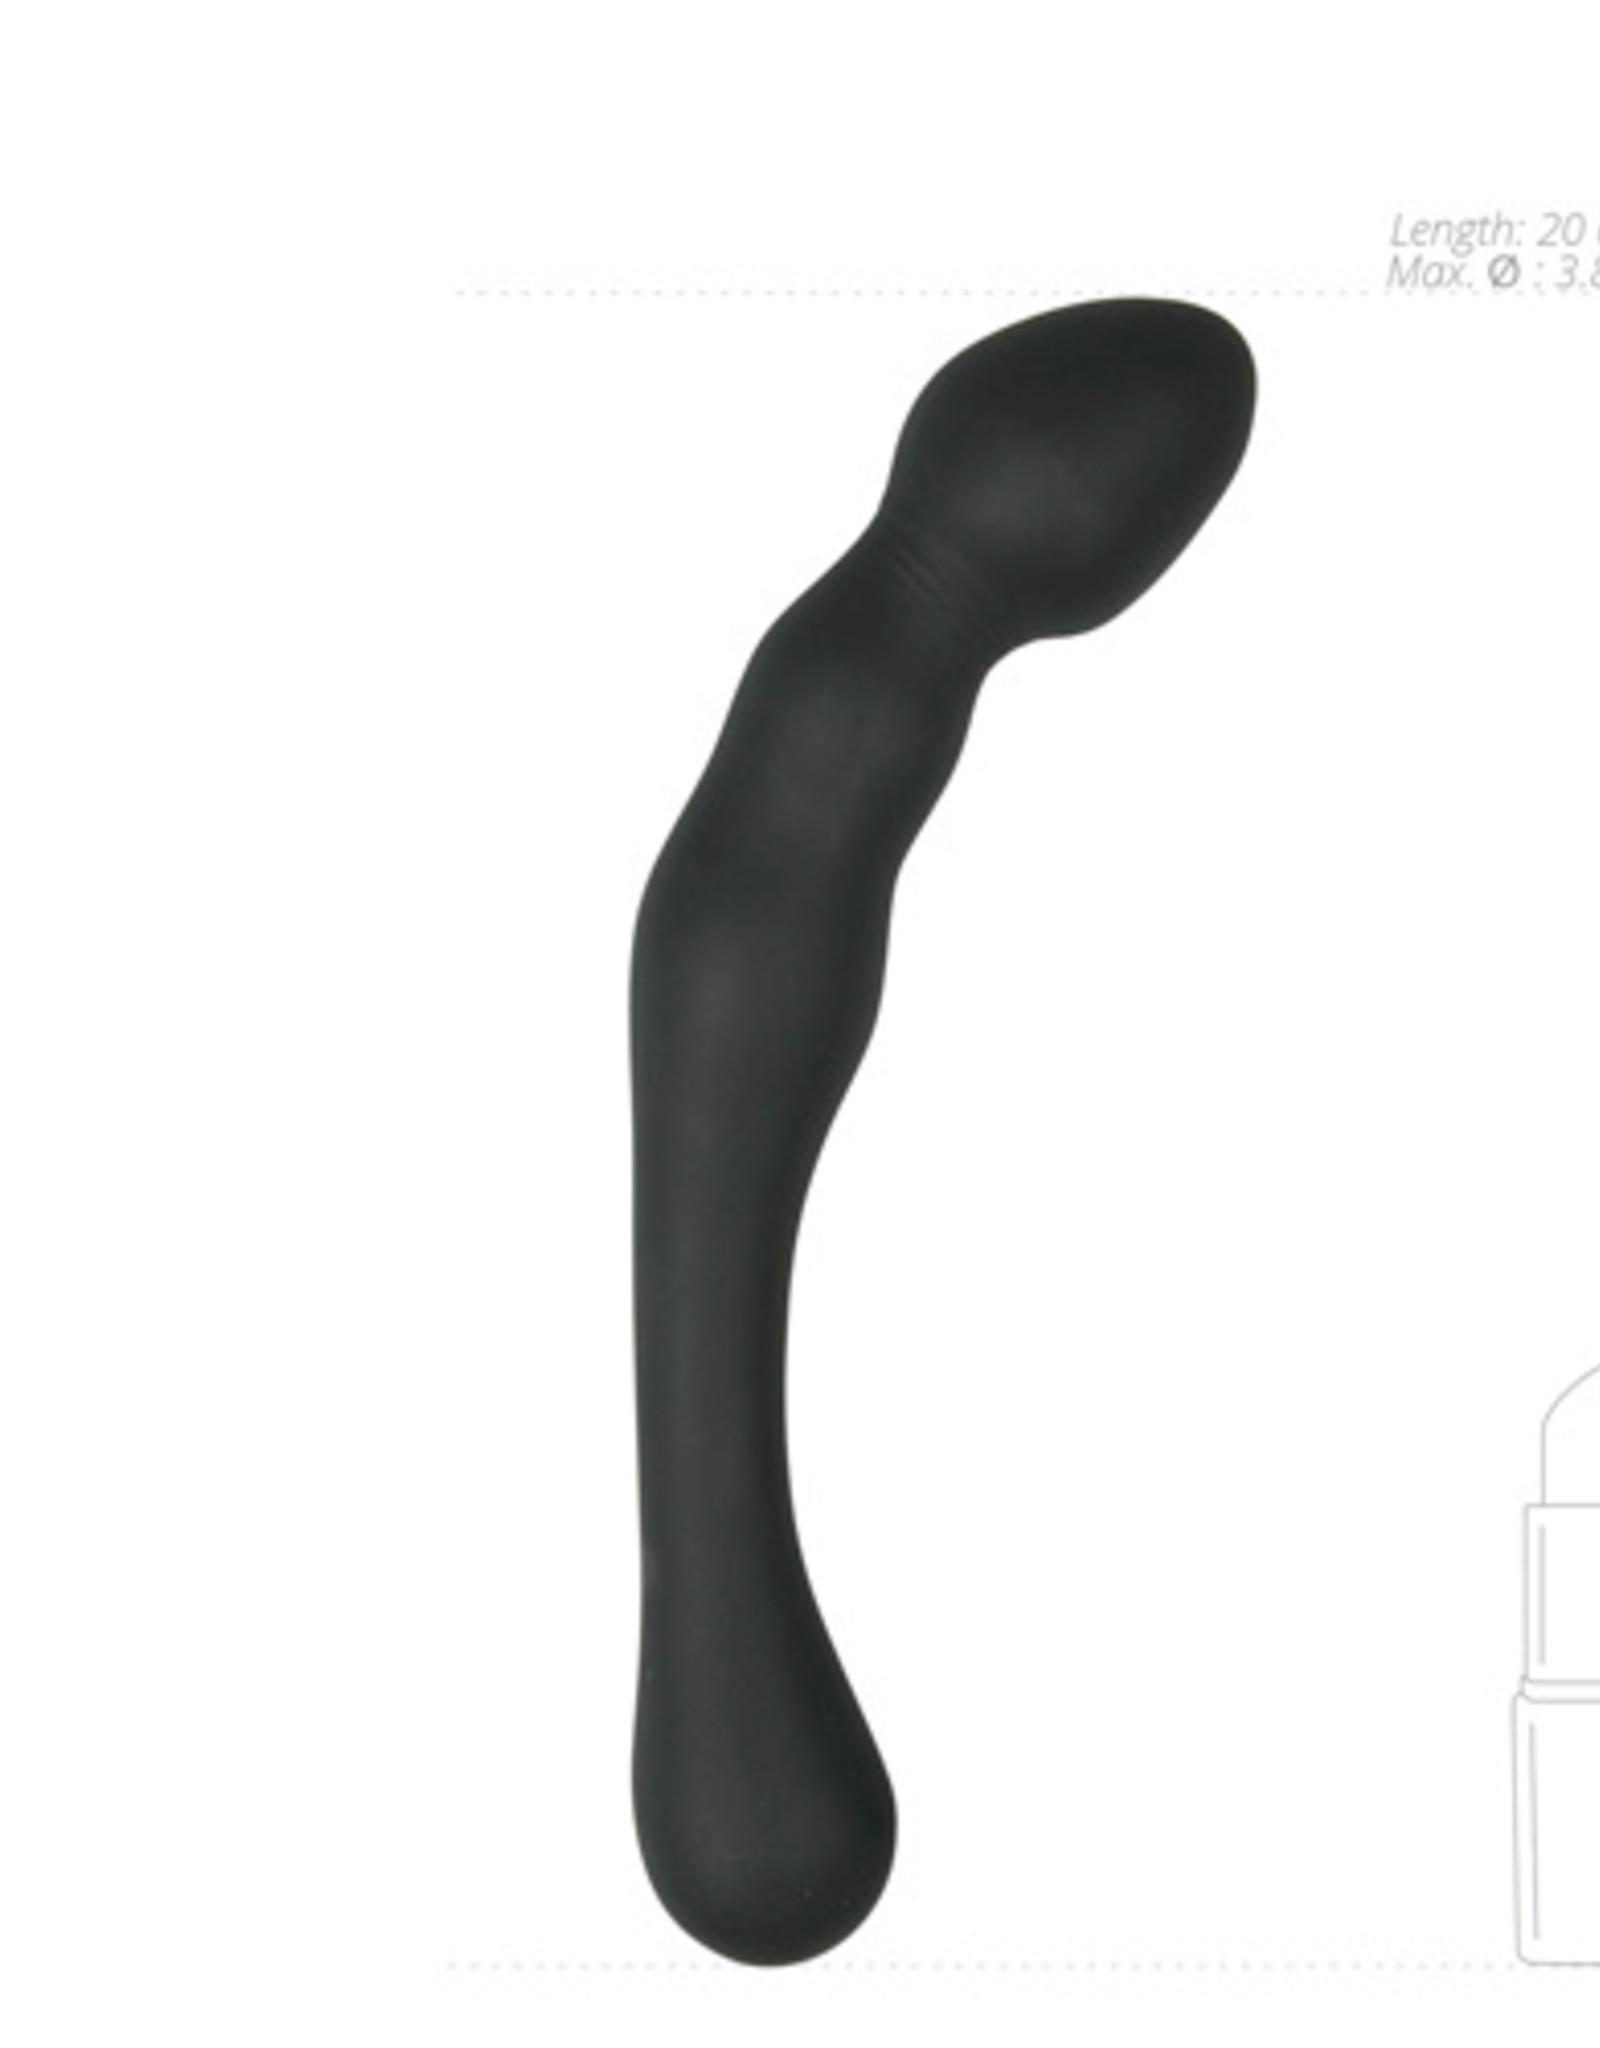 Easytoys Anal Collection Anal Probe Prostaat Dildo No.1